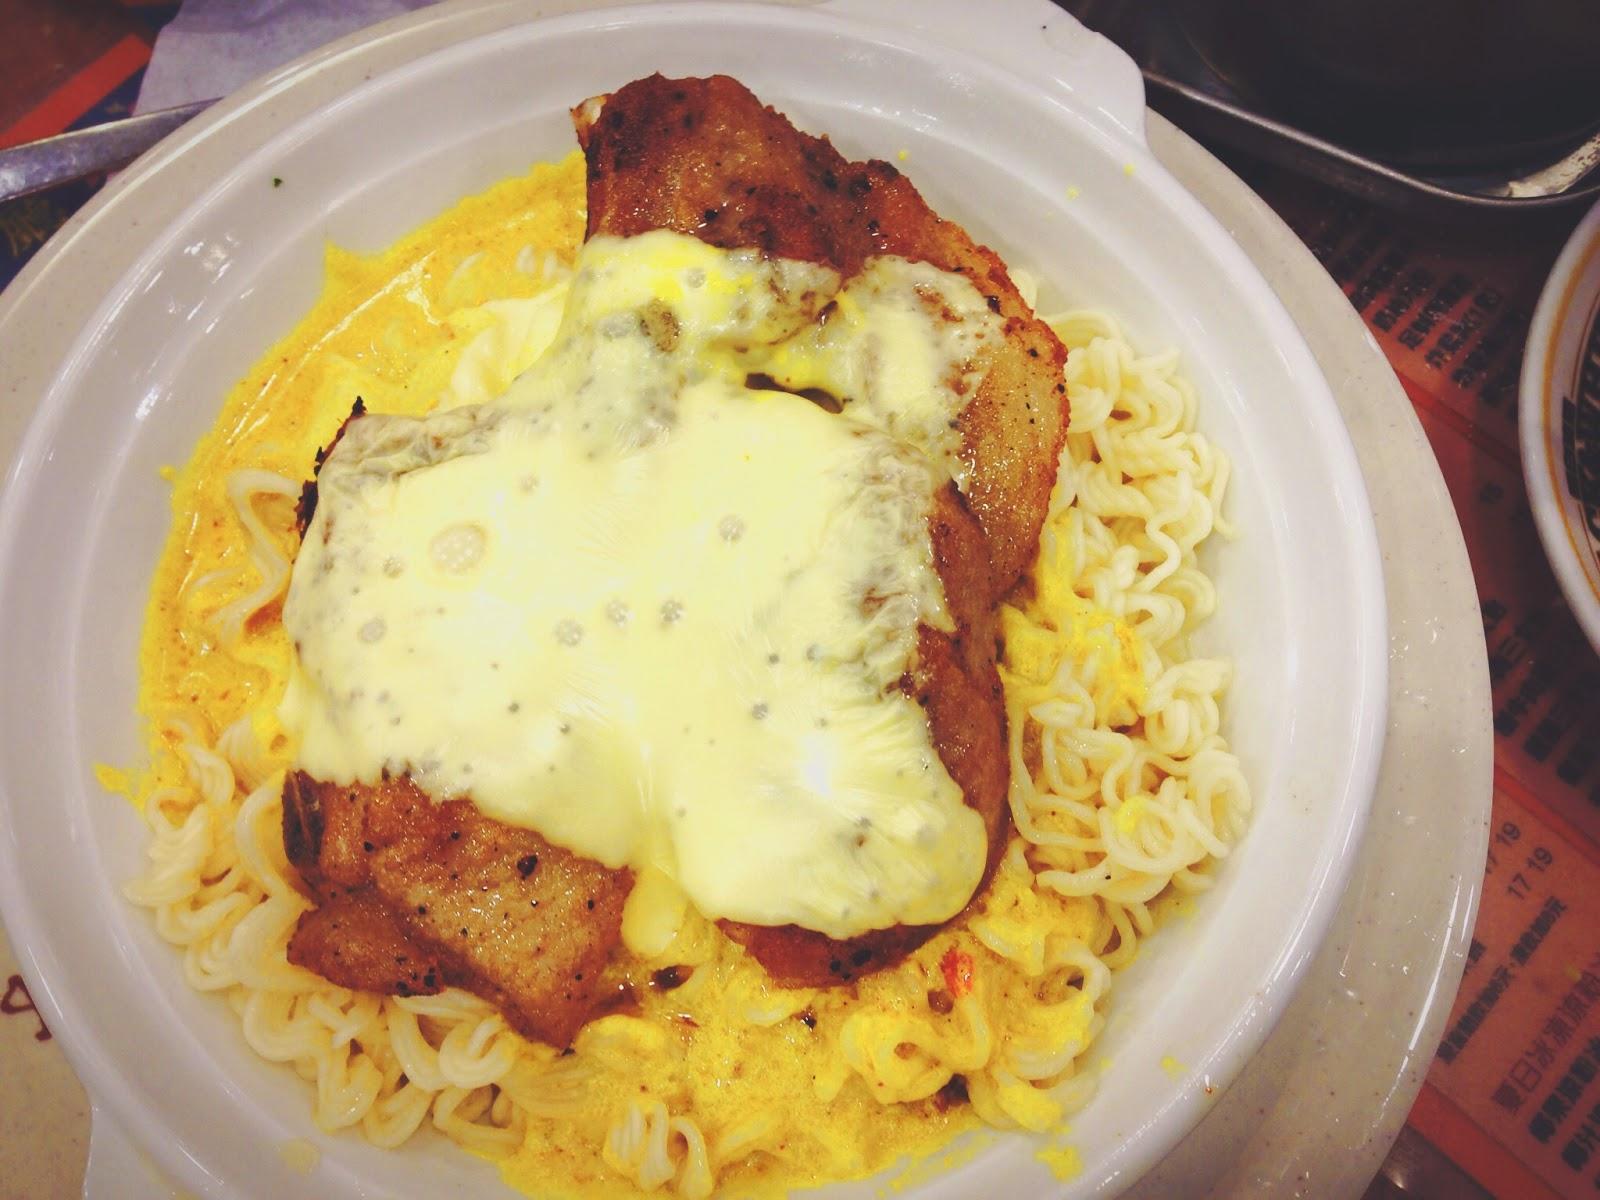 Kum Wah Cafe Hong Kong Curry Baked Pork Chop Noodles